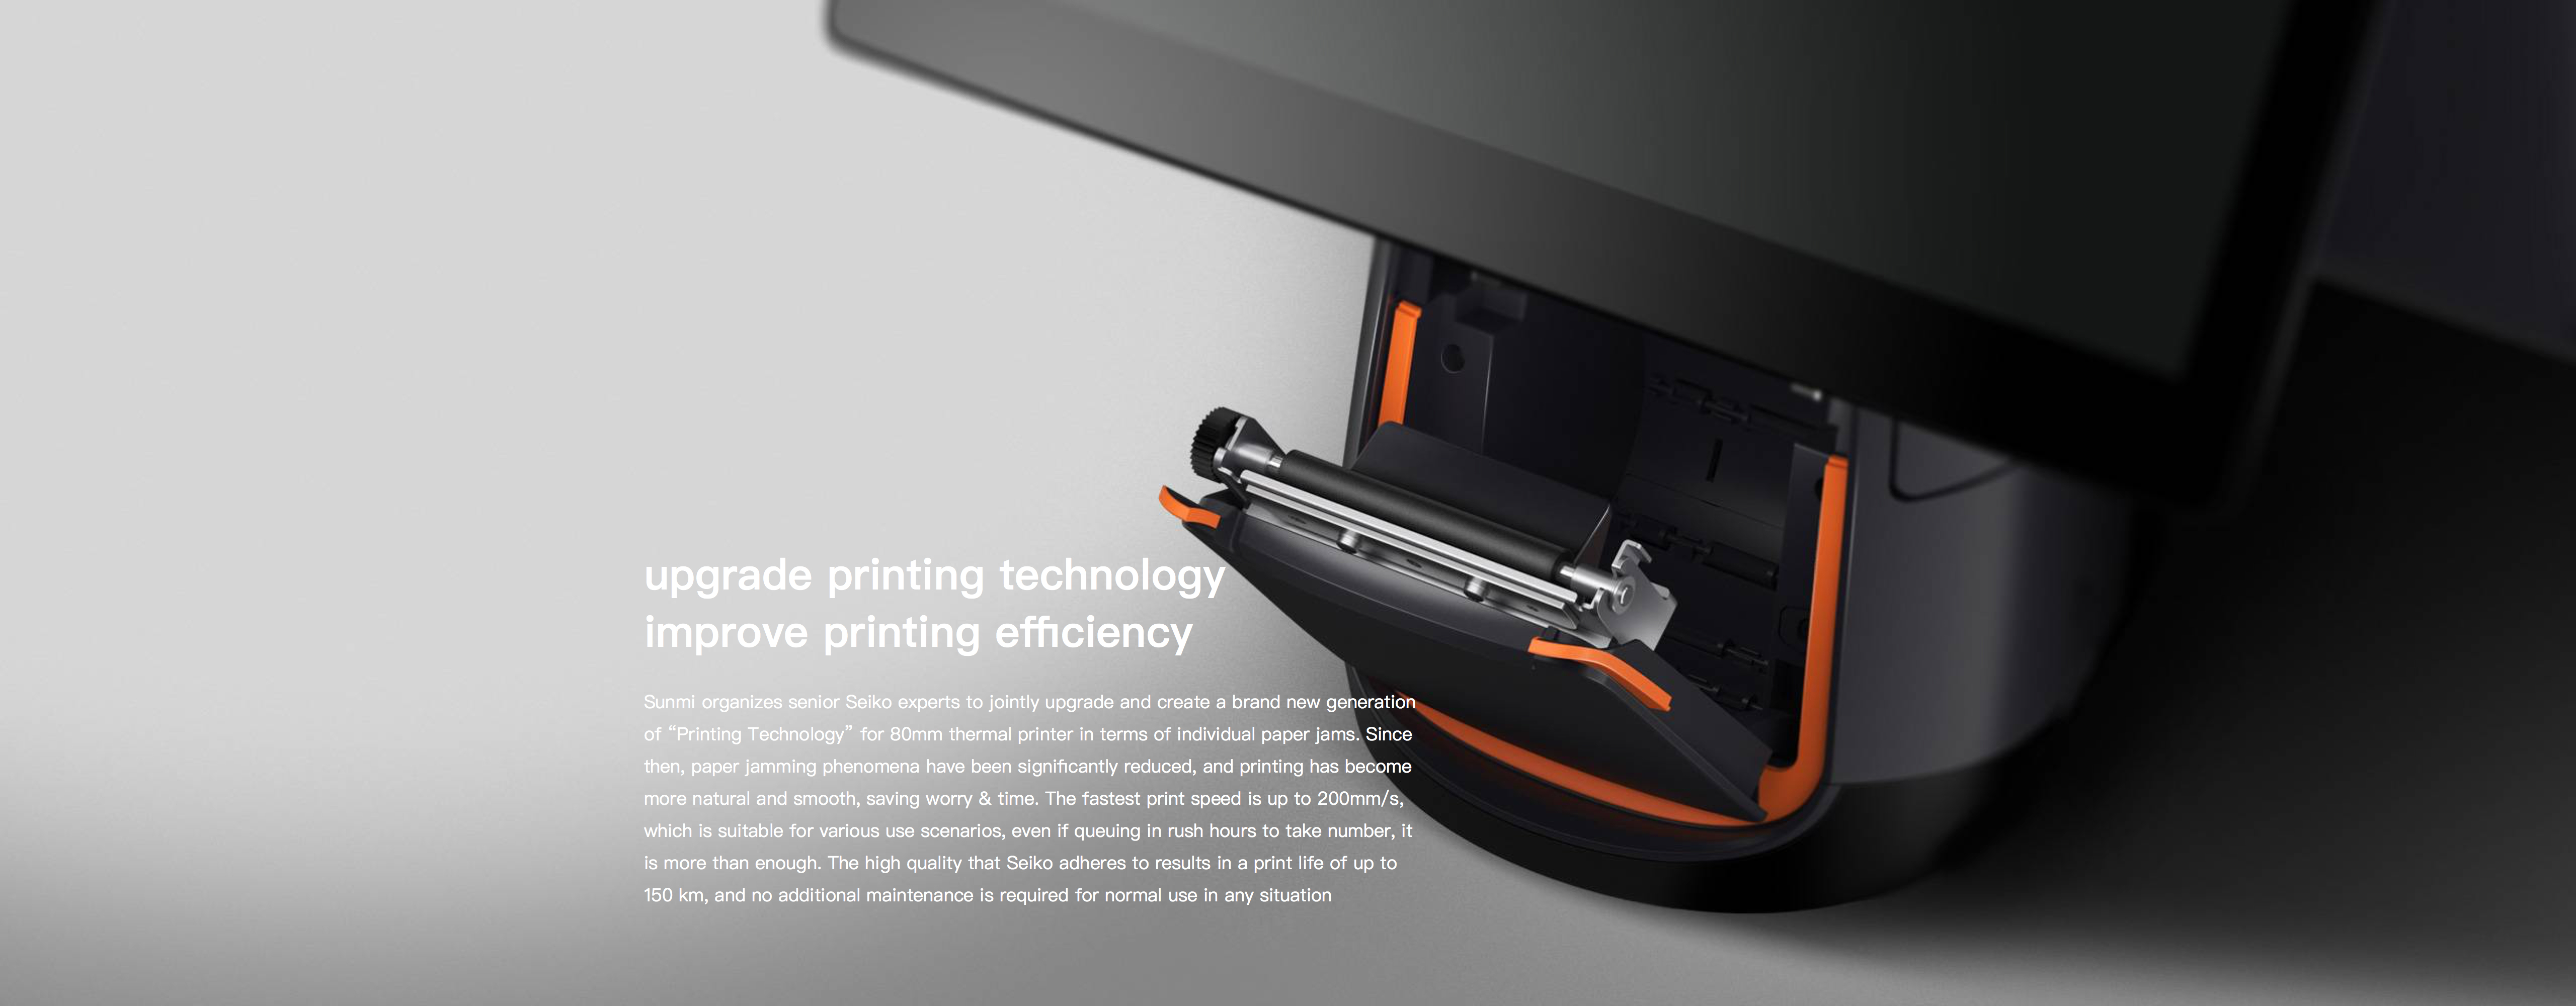 POS Sunmi T2 - Desktop Products - CÔNG TY CỔ PHẦN POSTECH